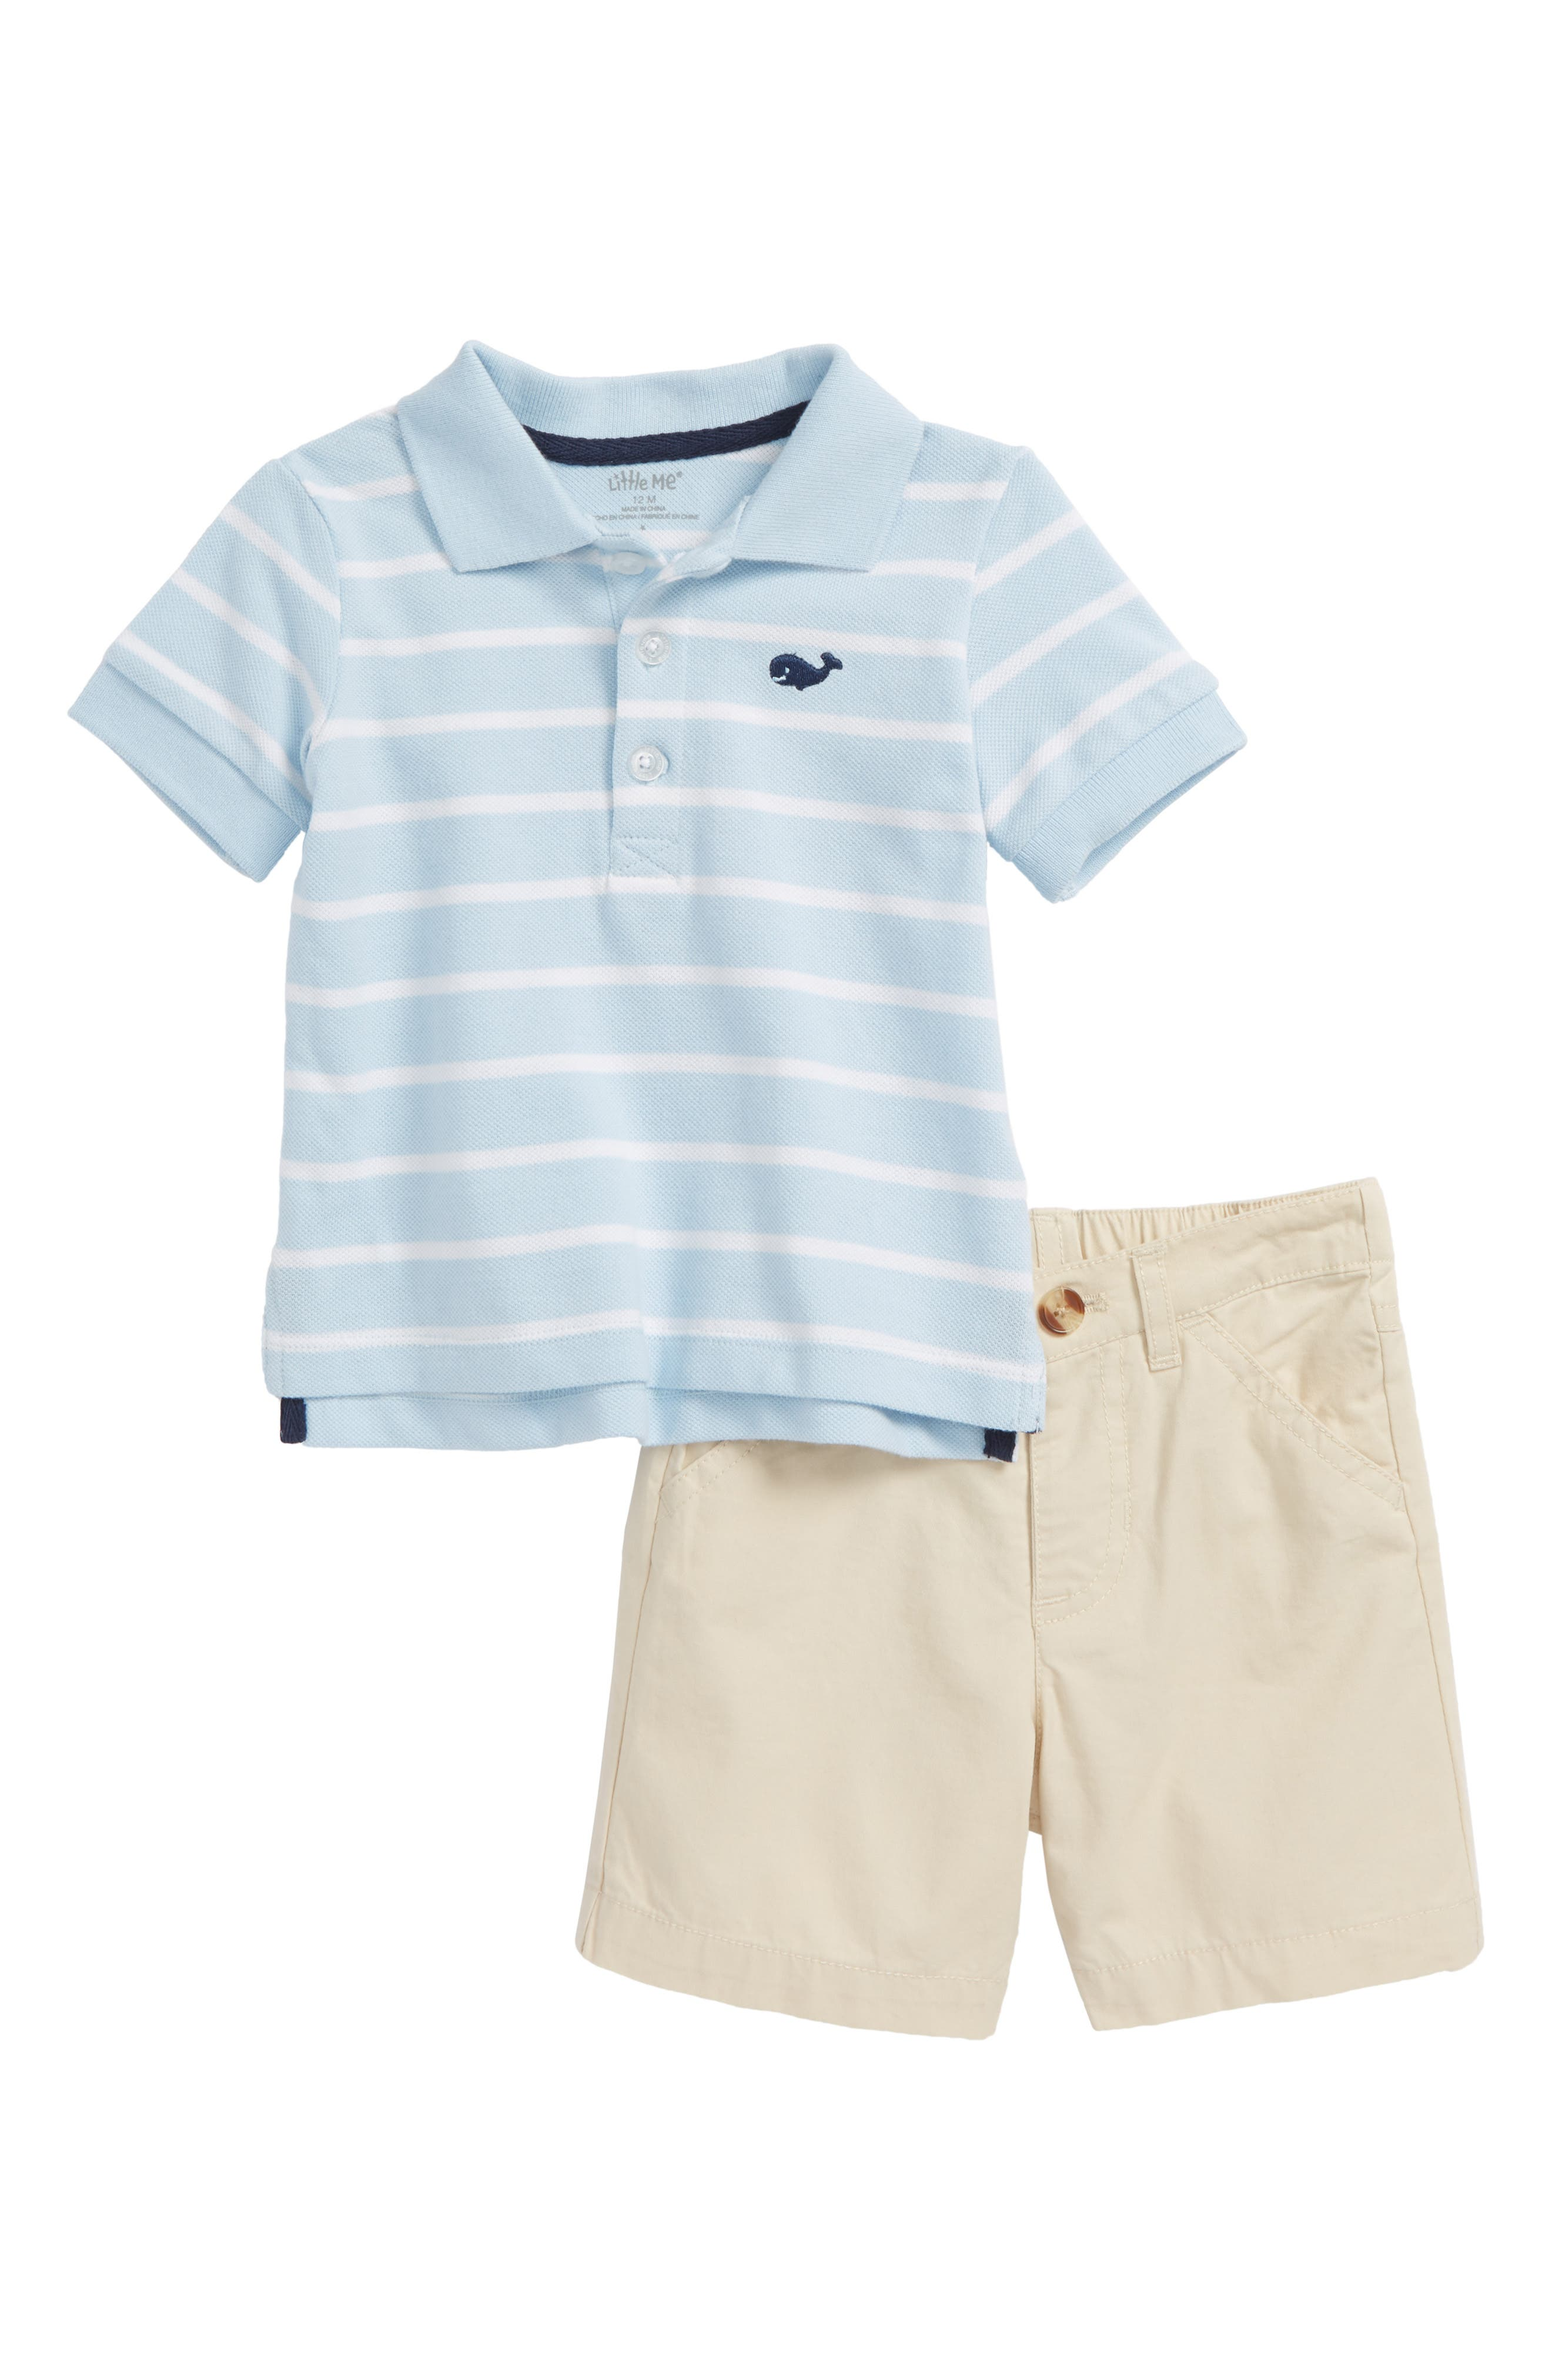 Whale Polo & Shorts Set,                         Main,                         color, Tan